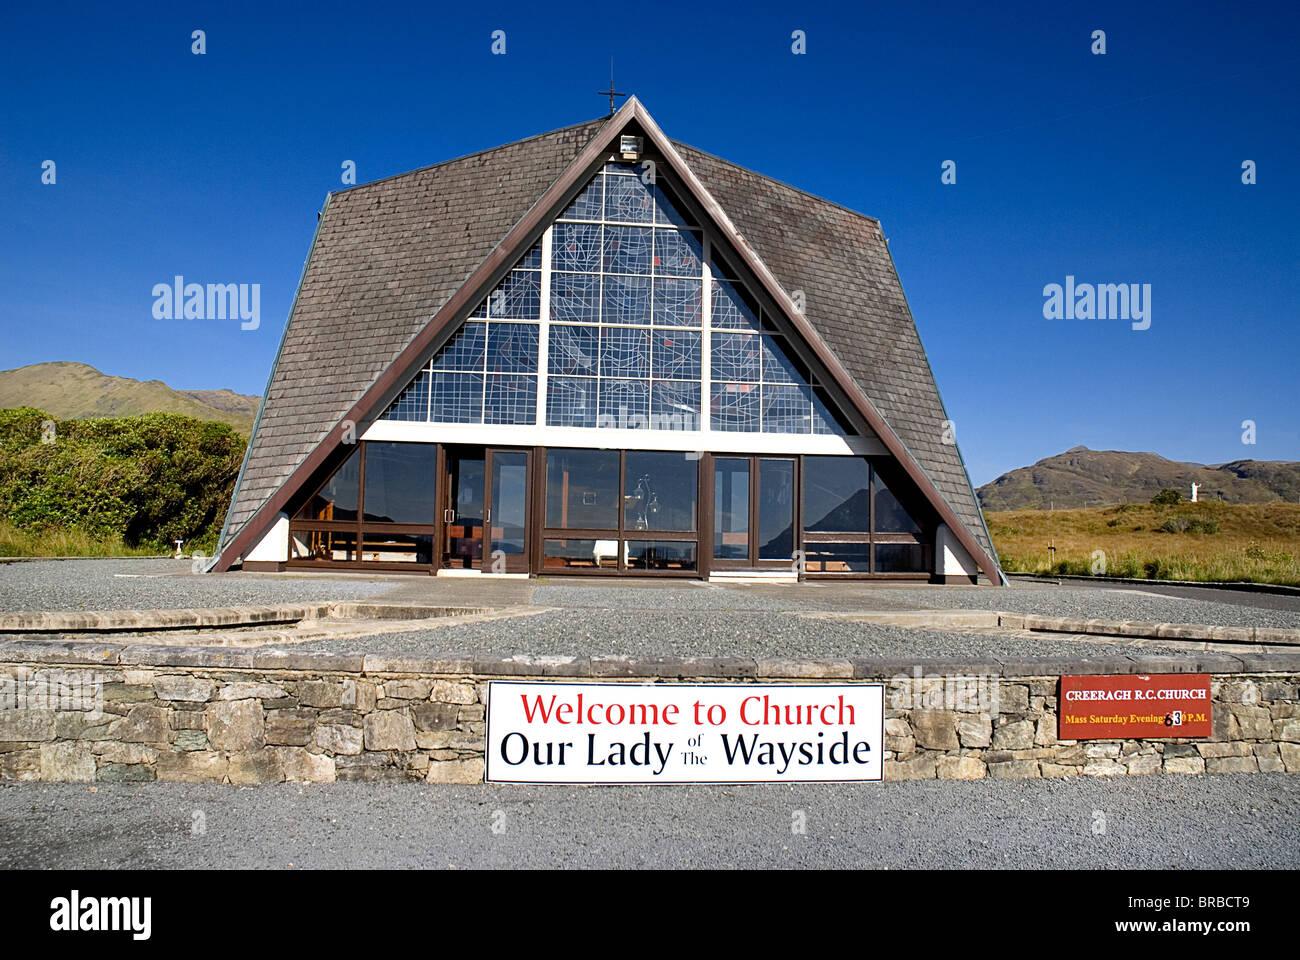 Connemara lady